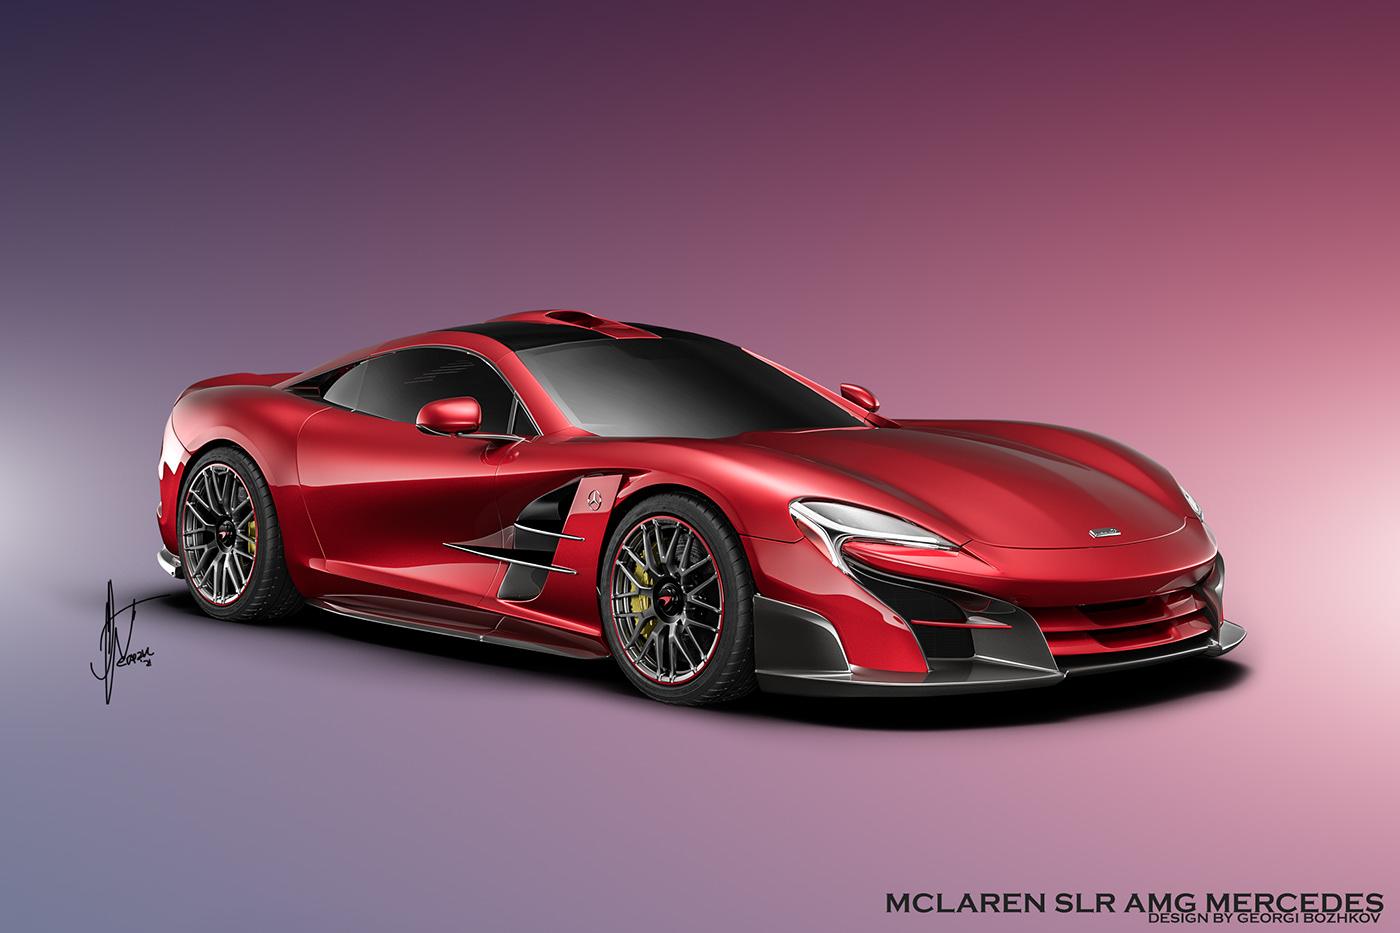 CONCEPT-VISION FRONTENGINED McLaren MCLAREN-COUPE MCLAREN-MERCEDES MERCEDES-MCLAREN slr SLR-AMG SLR-MCLAREN vision